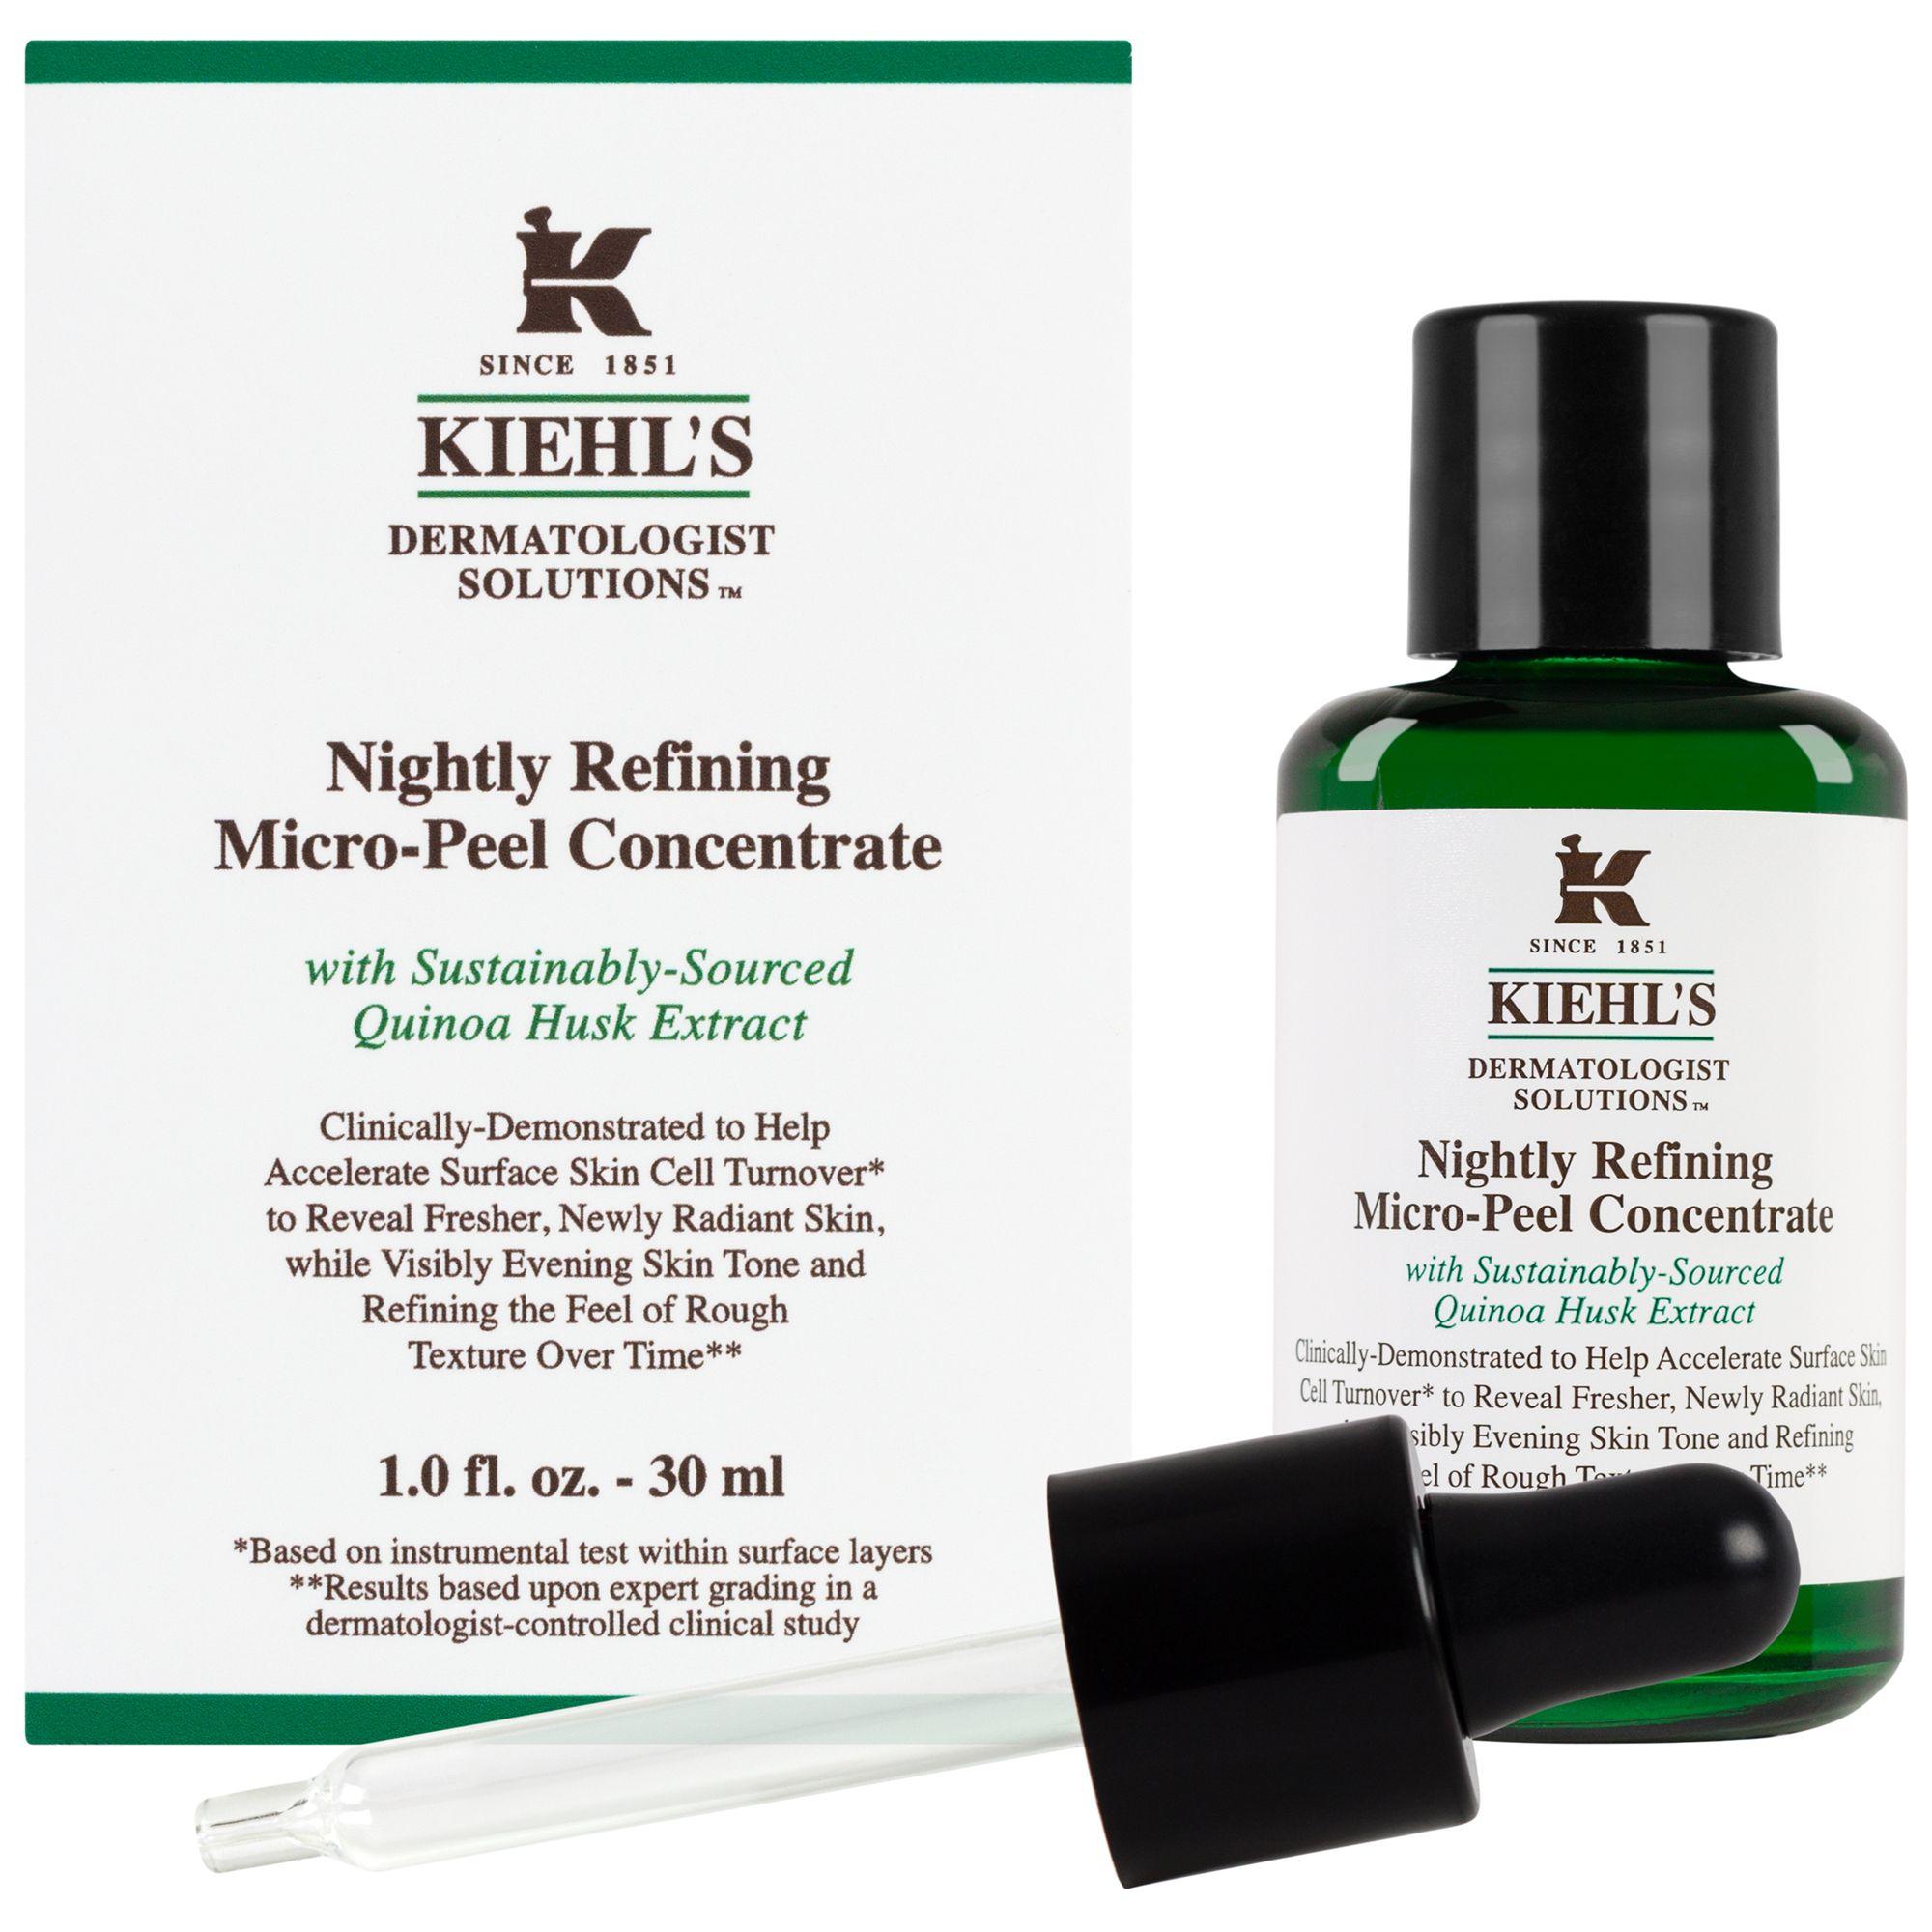 Kiehls Kiehl's Nightly Refining Micro-Peel Concentrate, 30ml